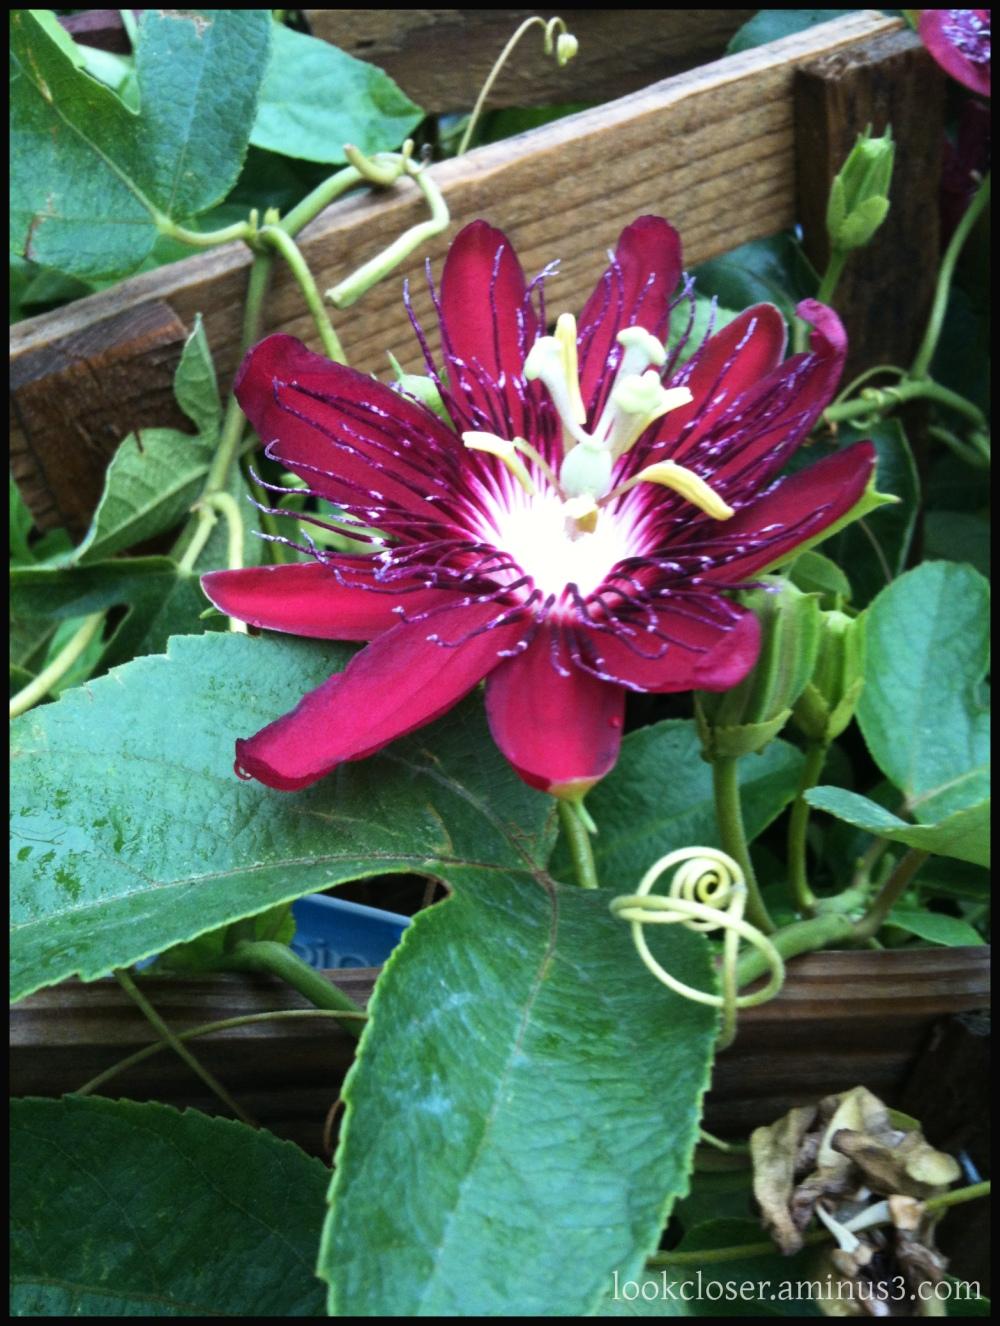 red passion vine flower